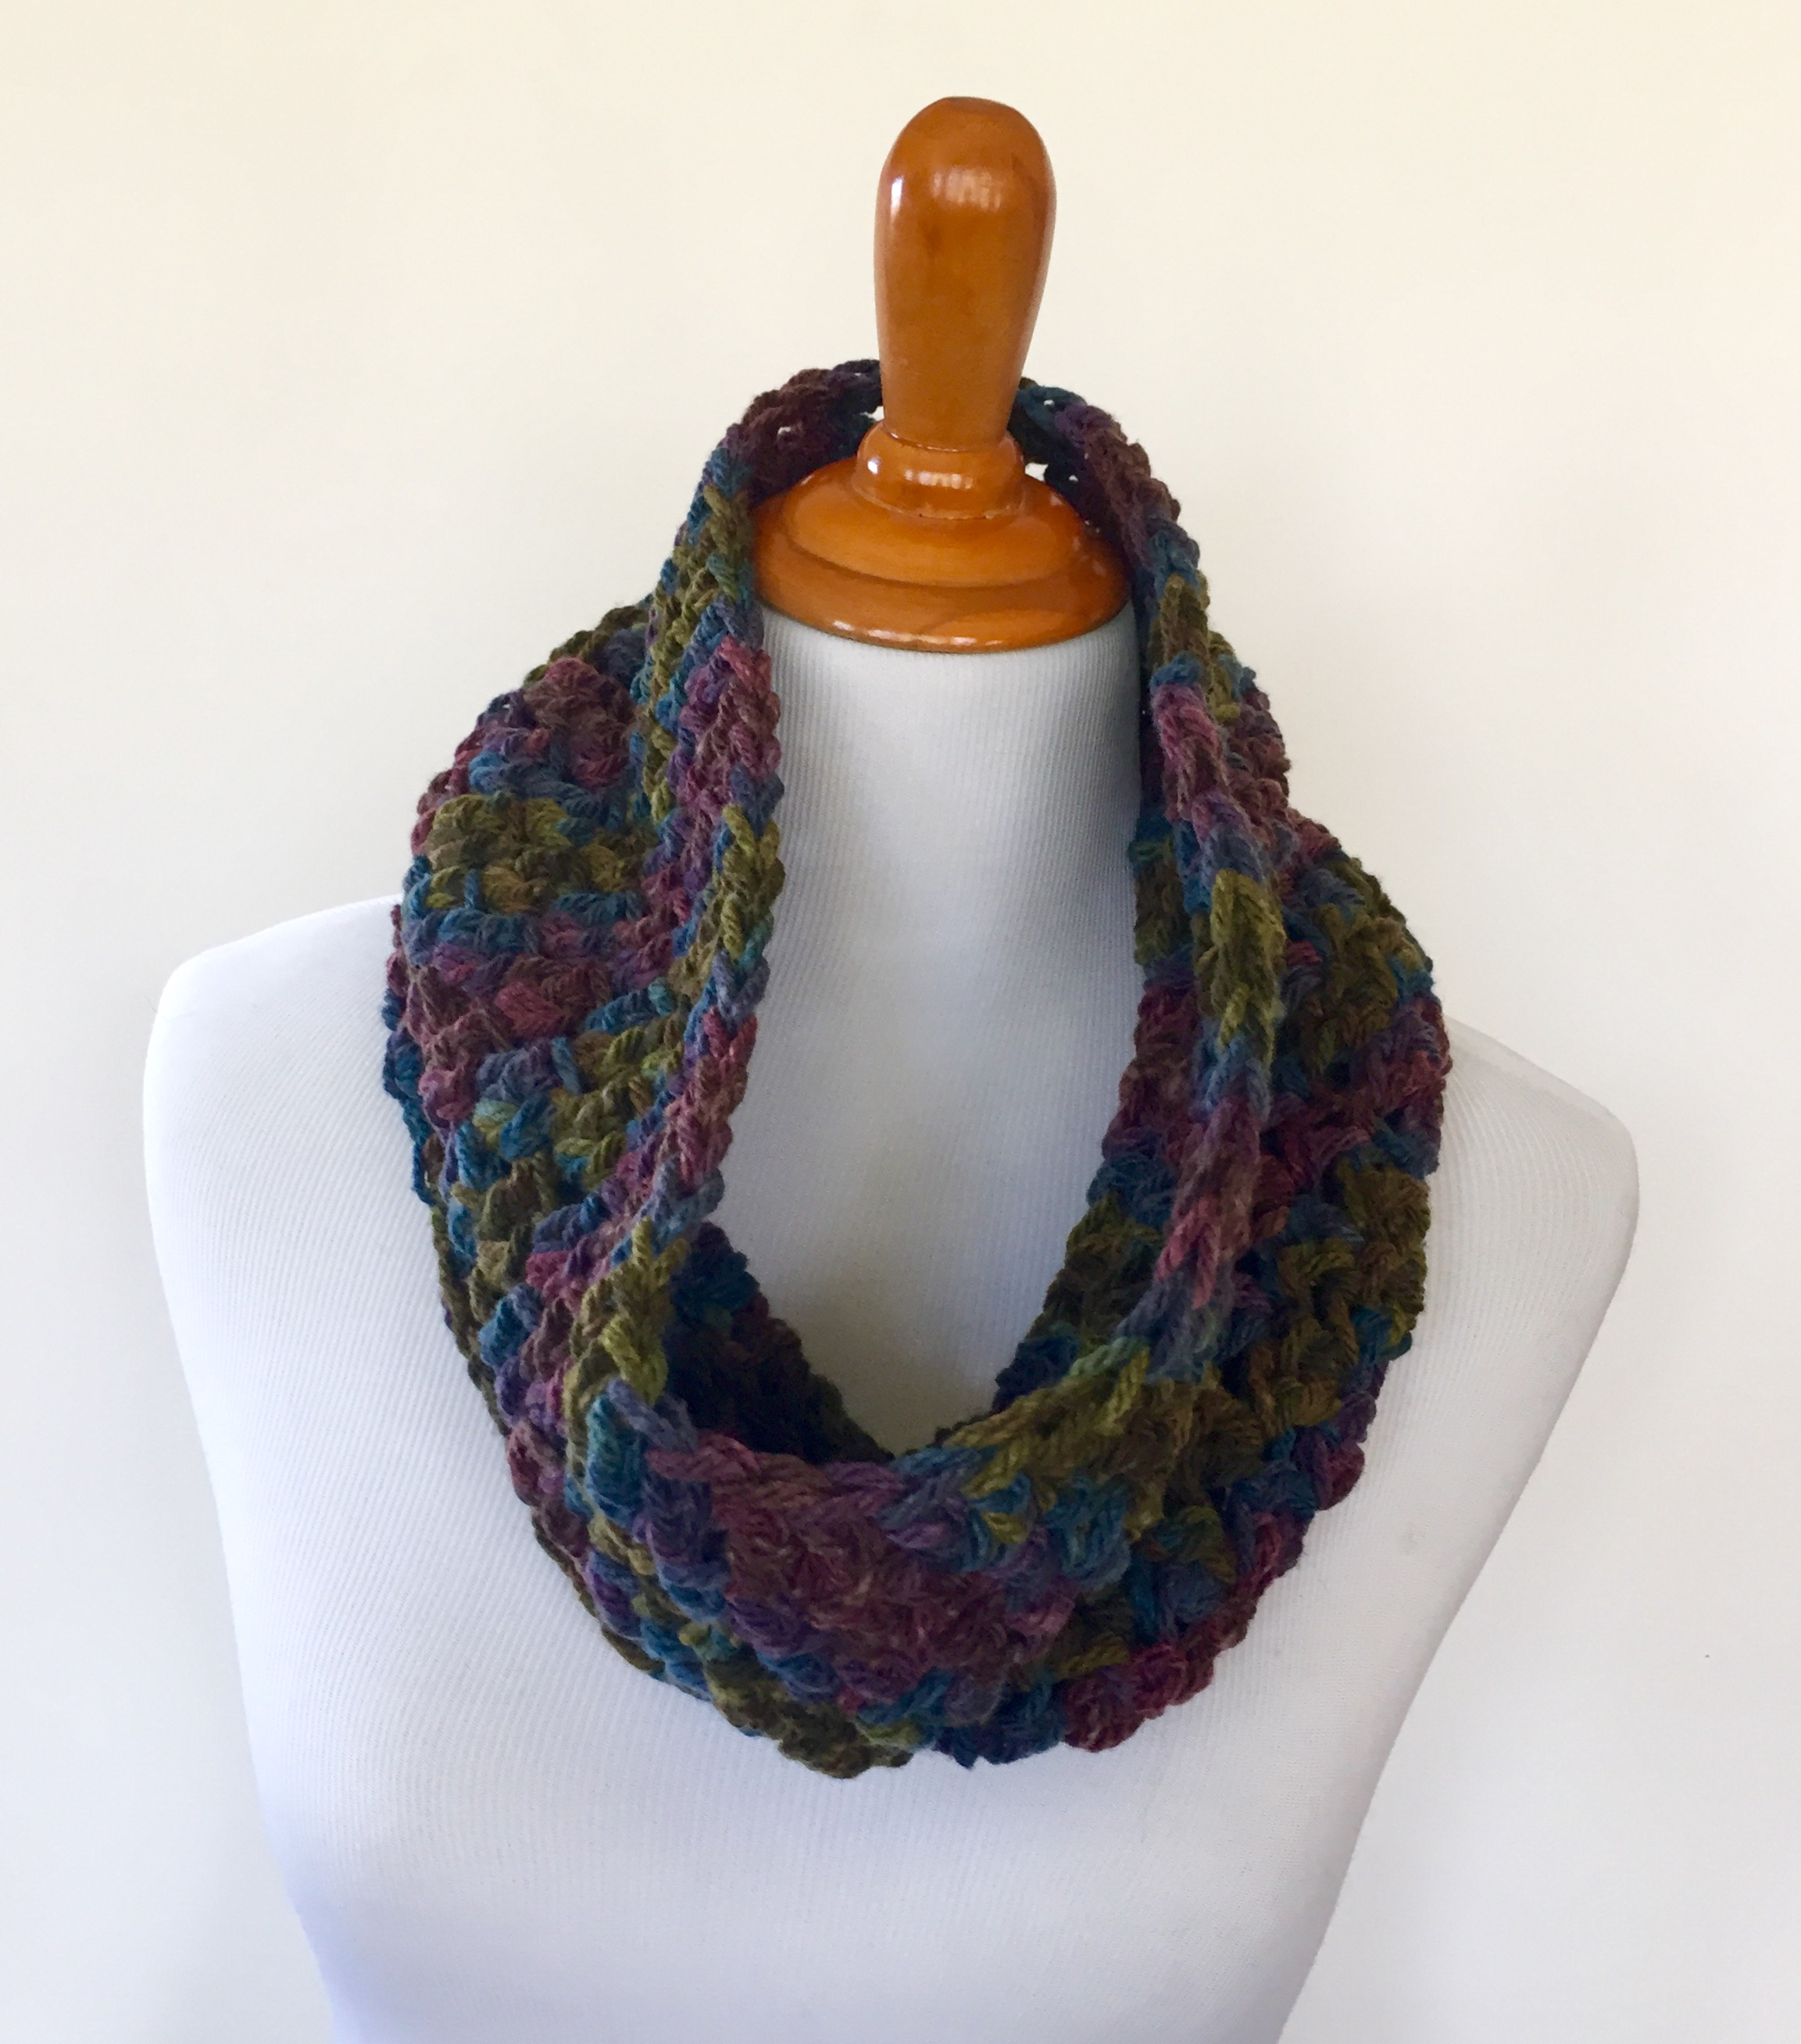 What You Should Know Before Proceeding Crochet Chunky Yarn Patterns Crochet Pattern Chunky Cowl Little Monkeys Designs